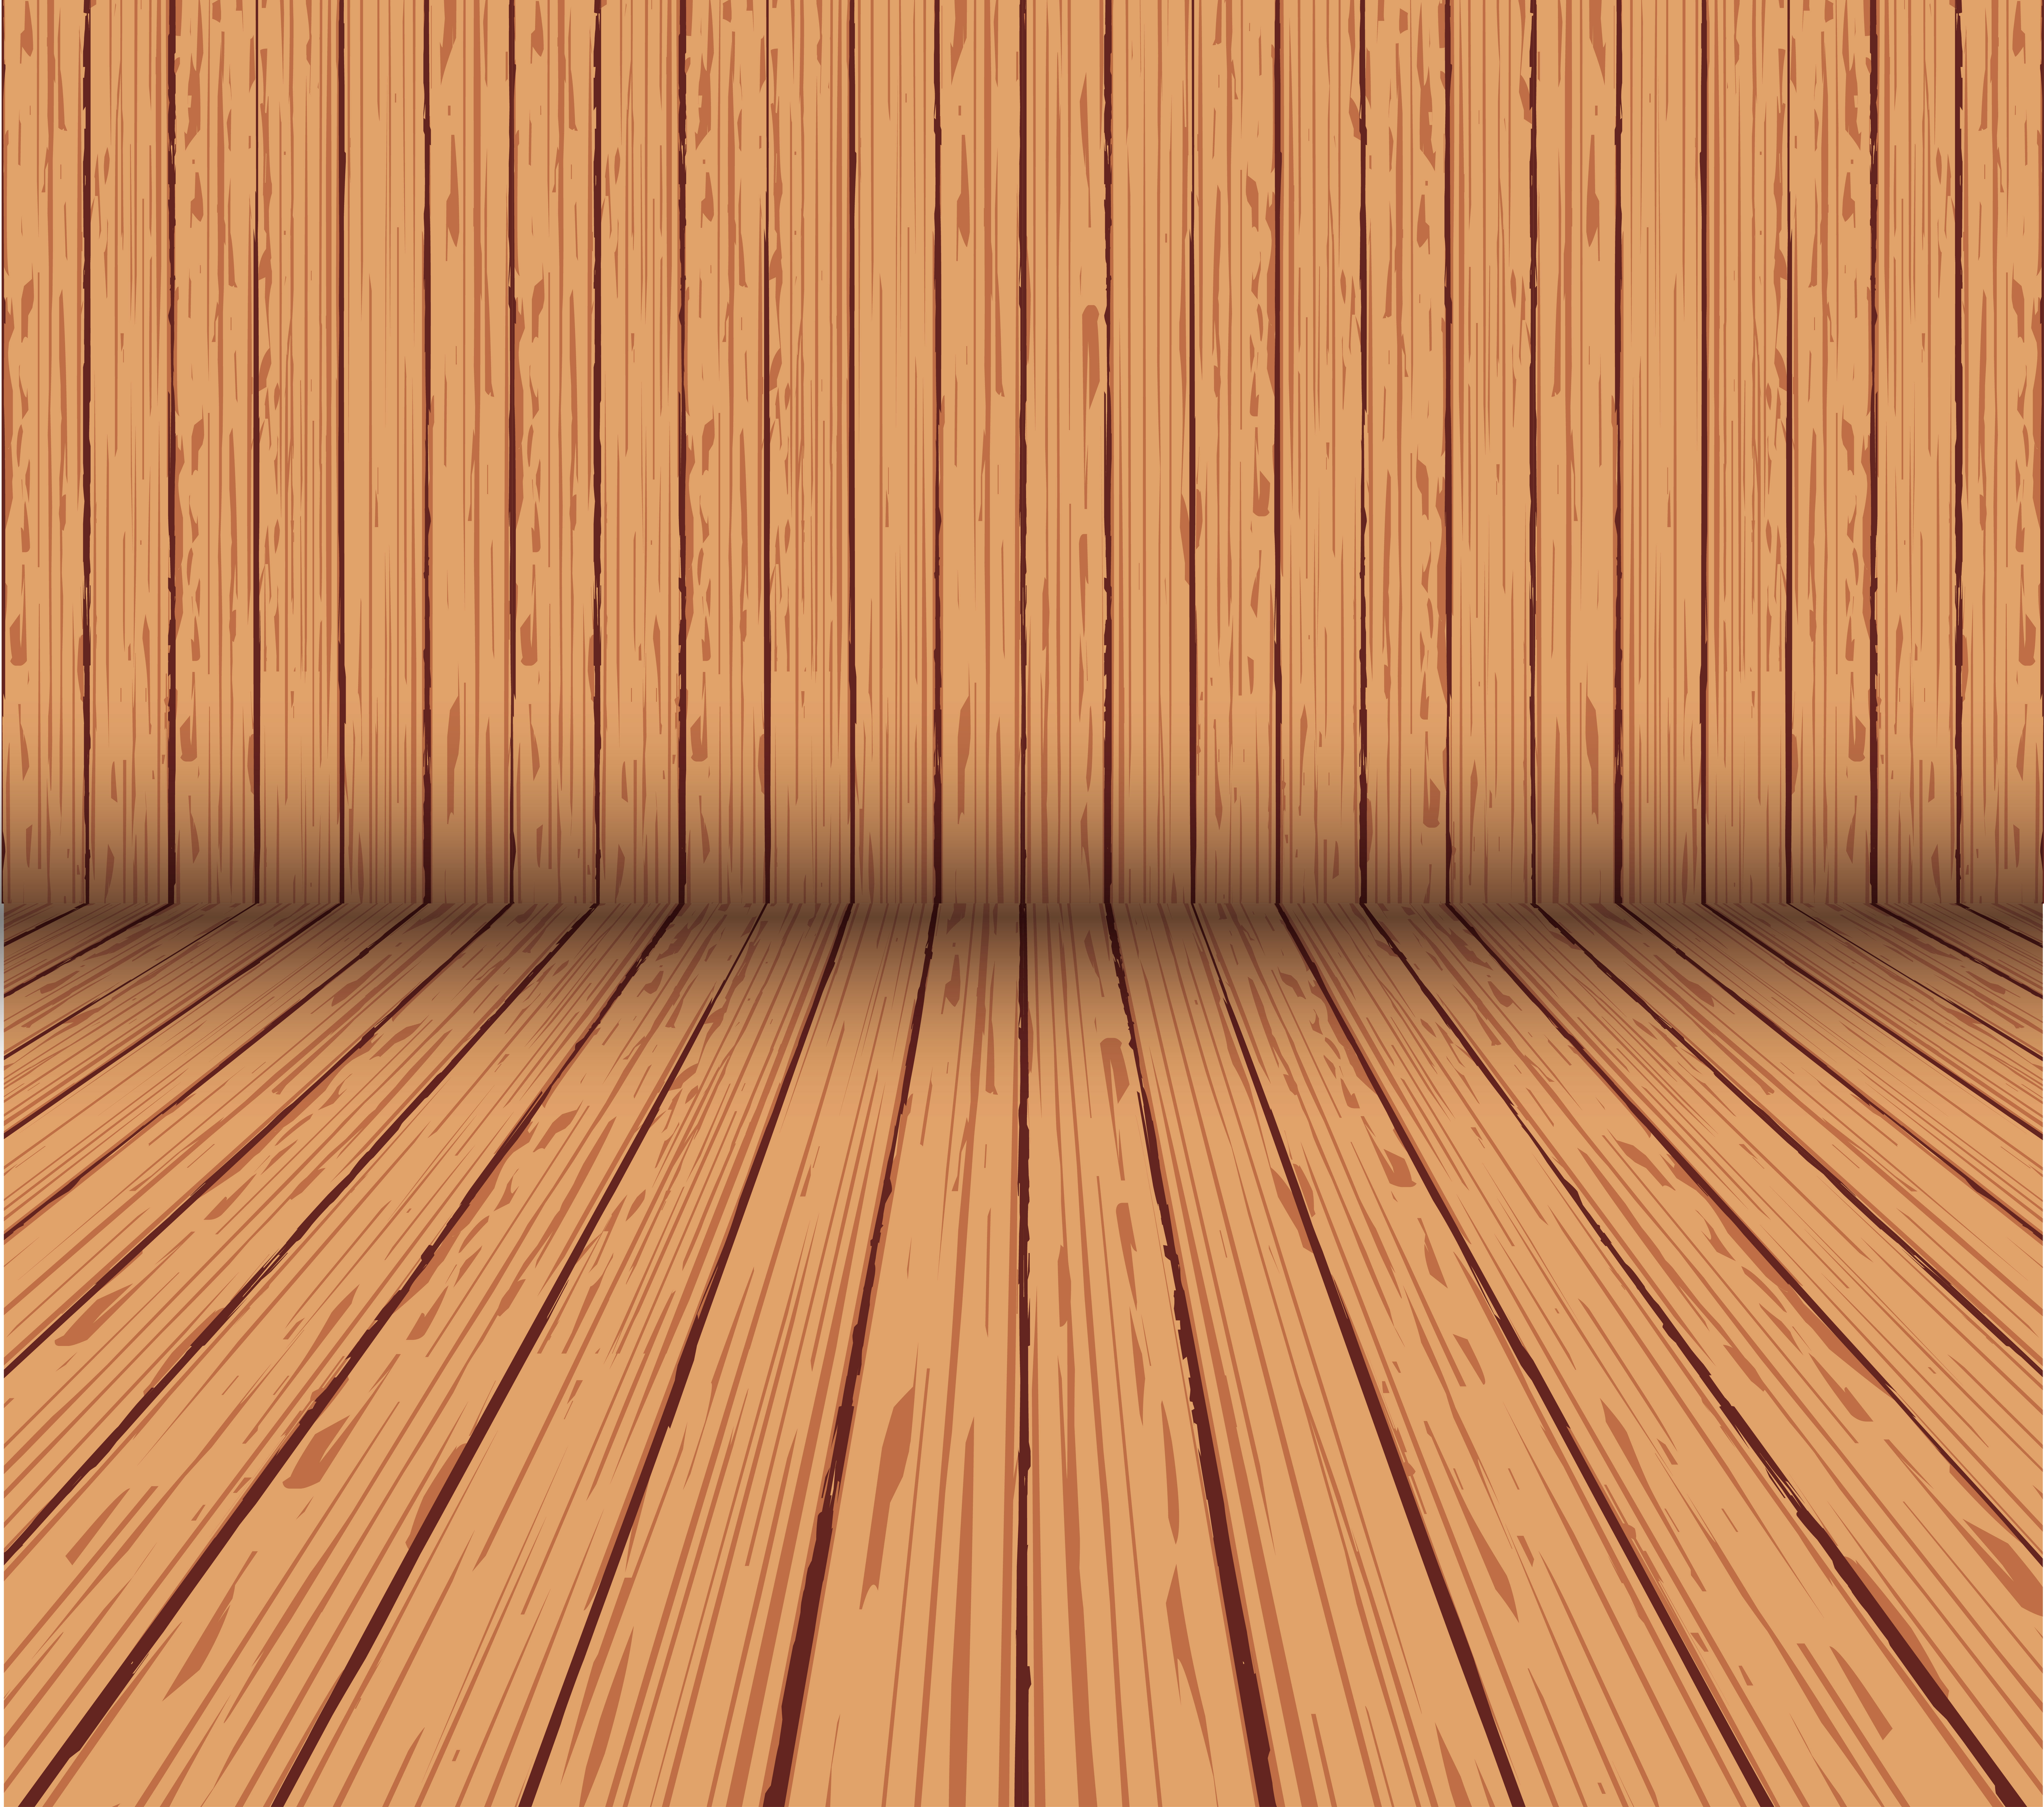 panel wood wall texture parquet floor interior pattern